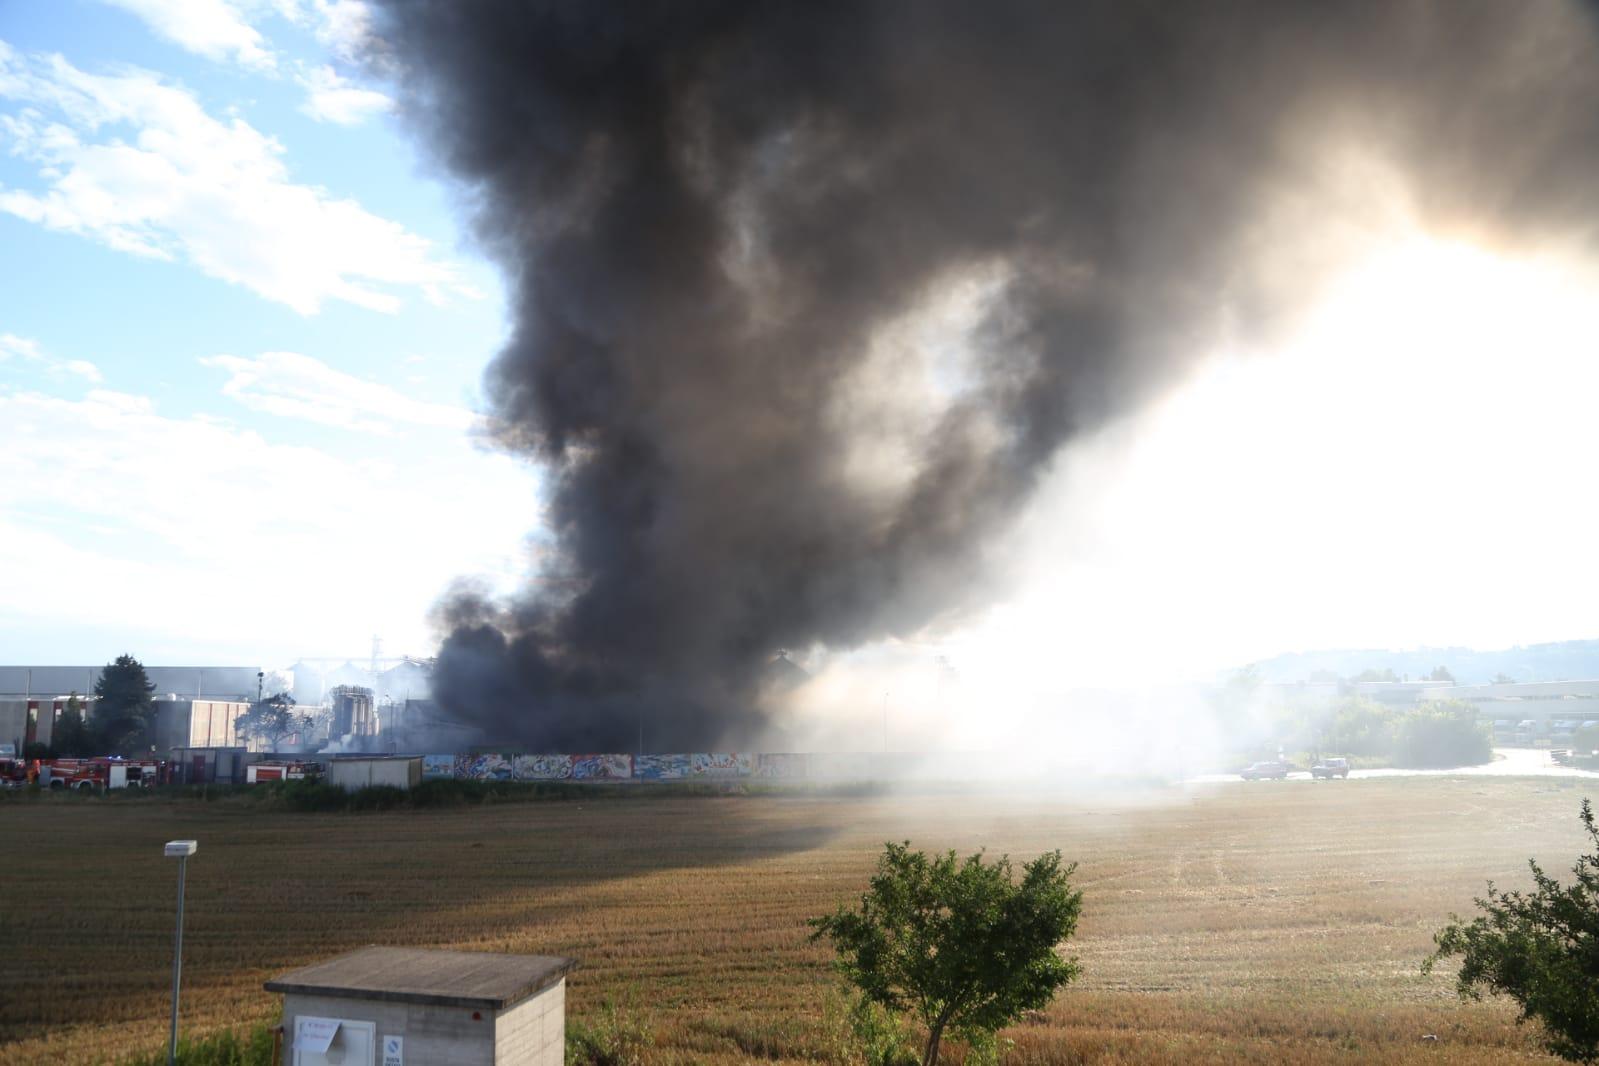 incendio_orim_piediripa_foto_AP_00003